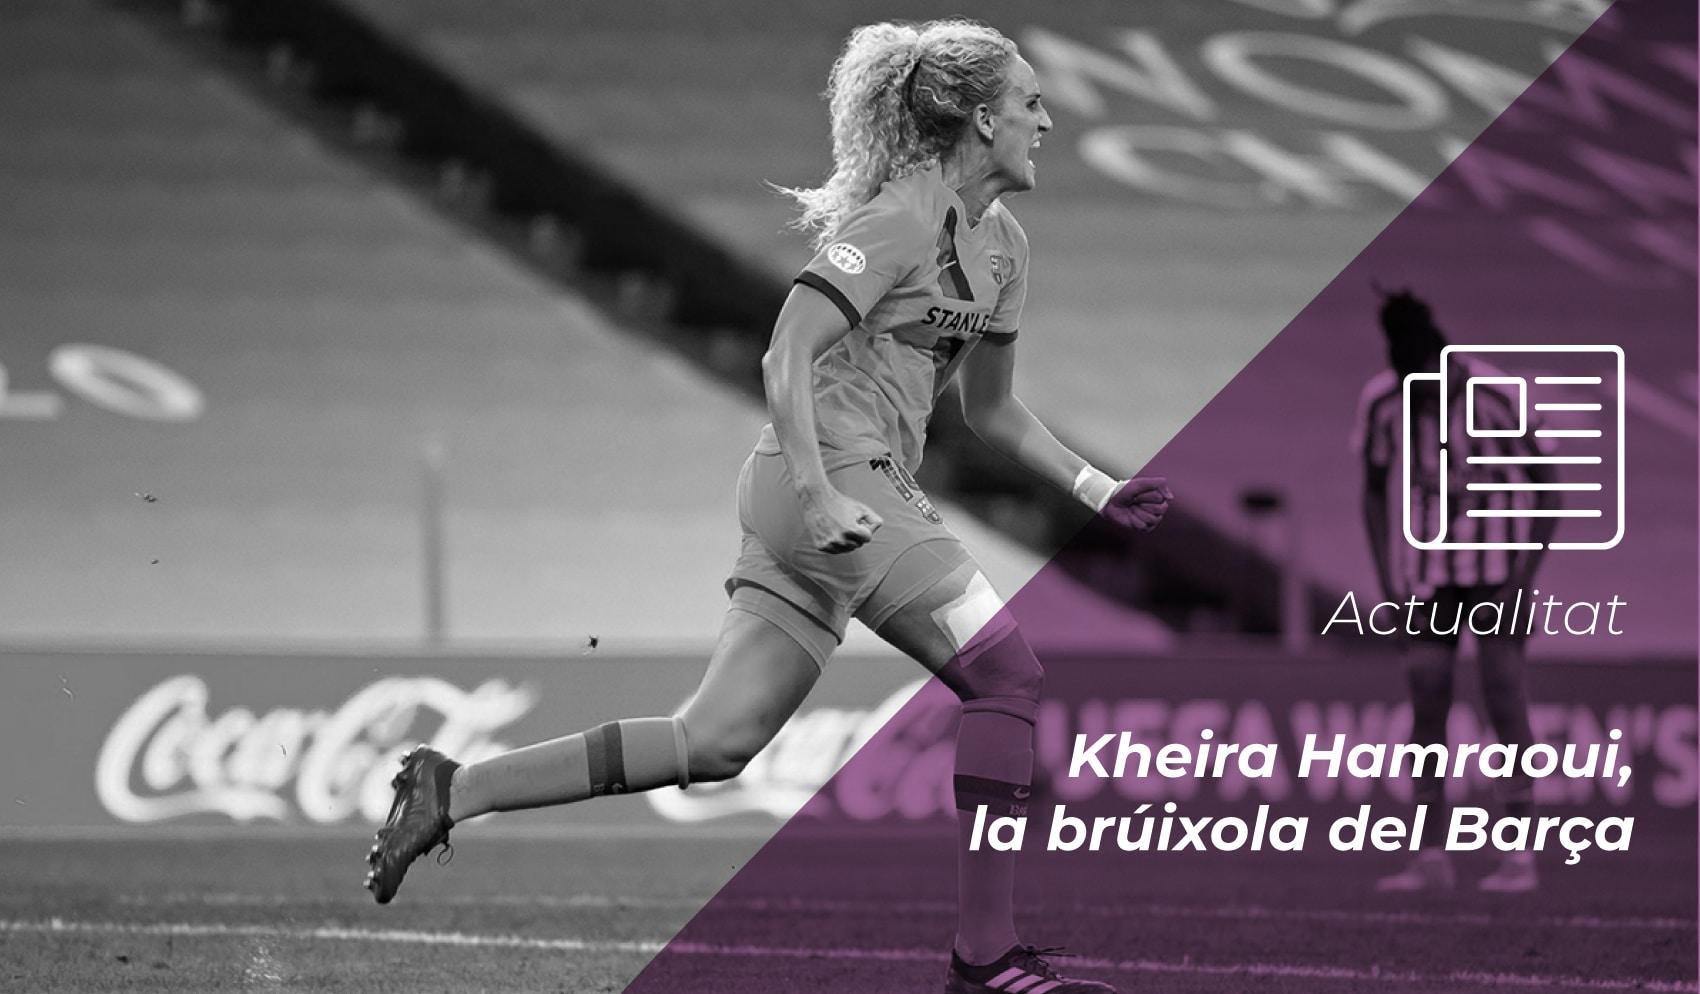 Kheira Hamraoui, la brúixola del Barça 2